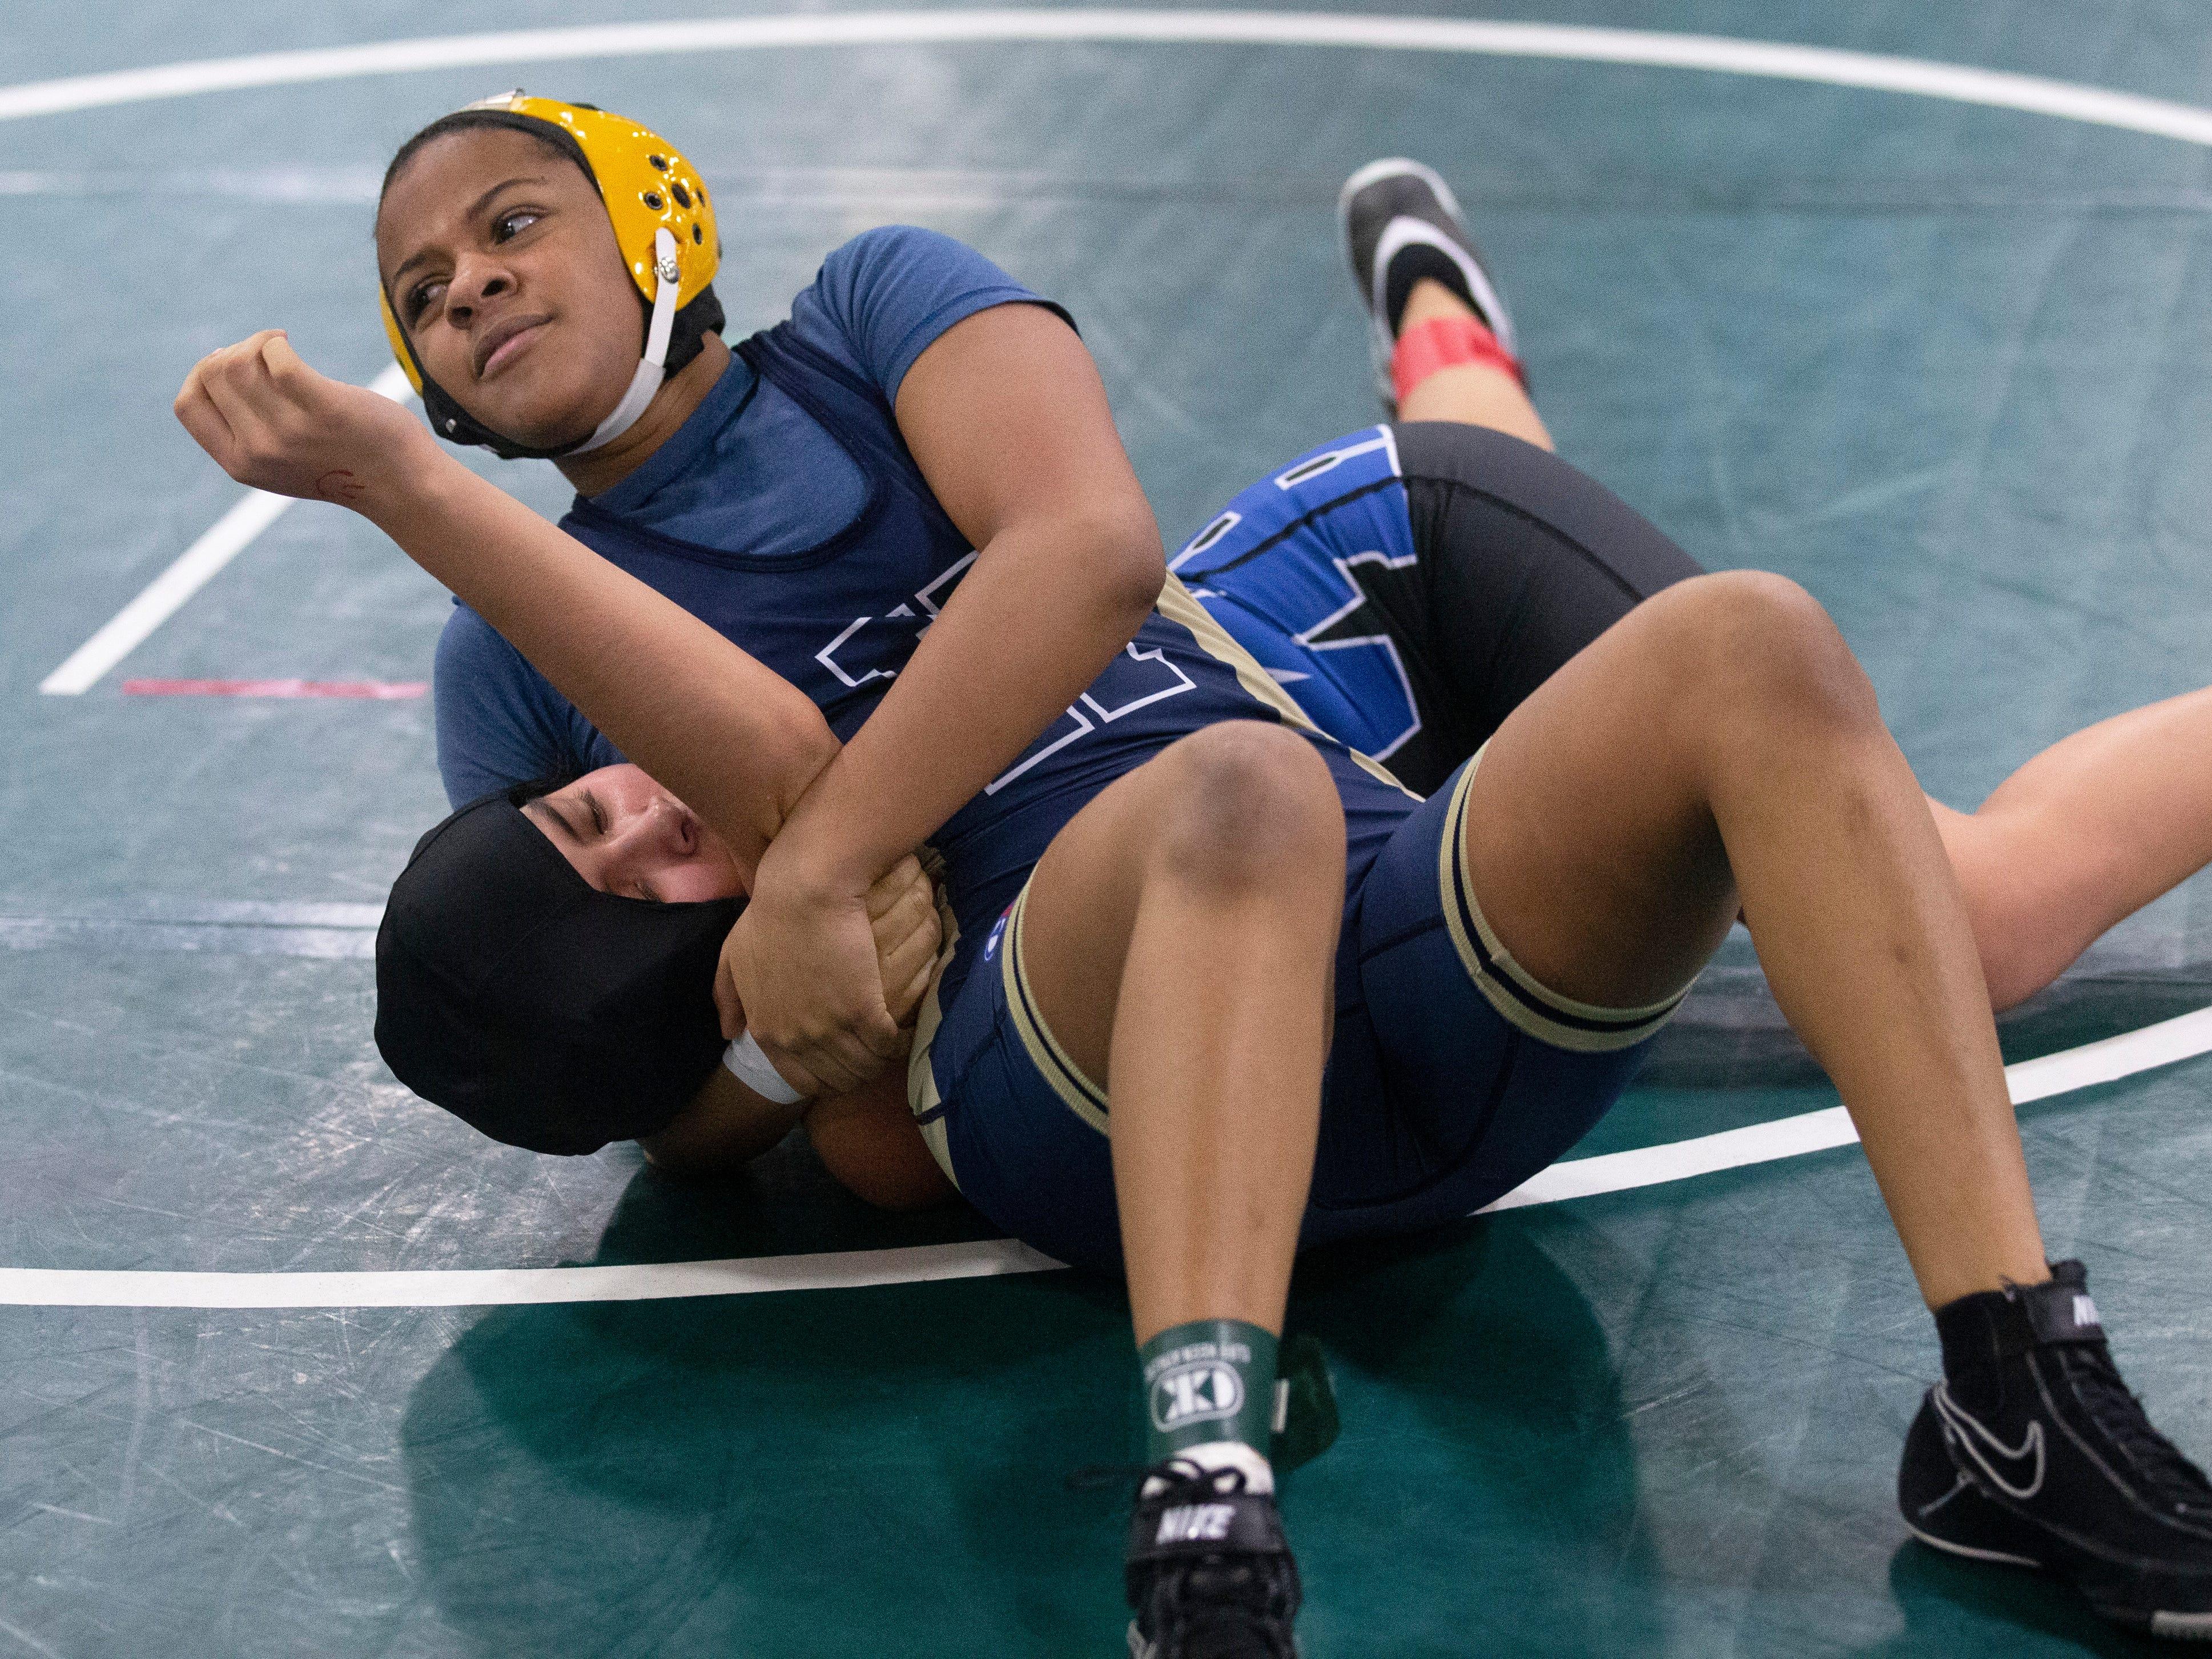 Hackensack's Nicole Montero pins Warren Hill's Reina Castro-Gomez in their 118 lbs. bout. NJSIAA Girls Region Wrestling at Red Bank Regional High School in Red Bank NJ on February 17, 2019.